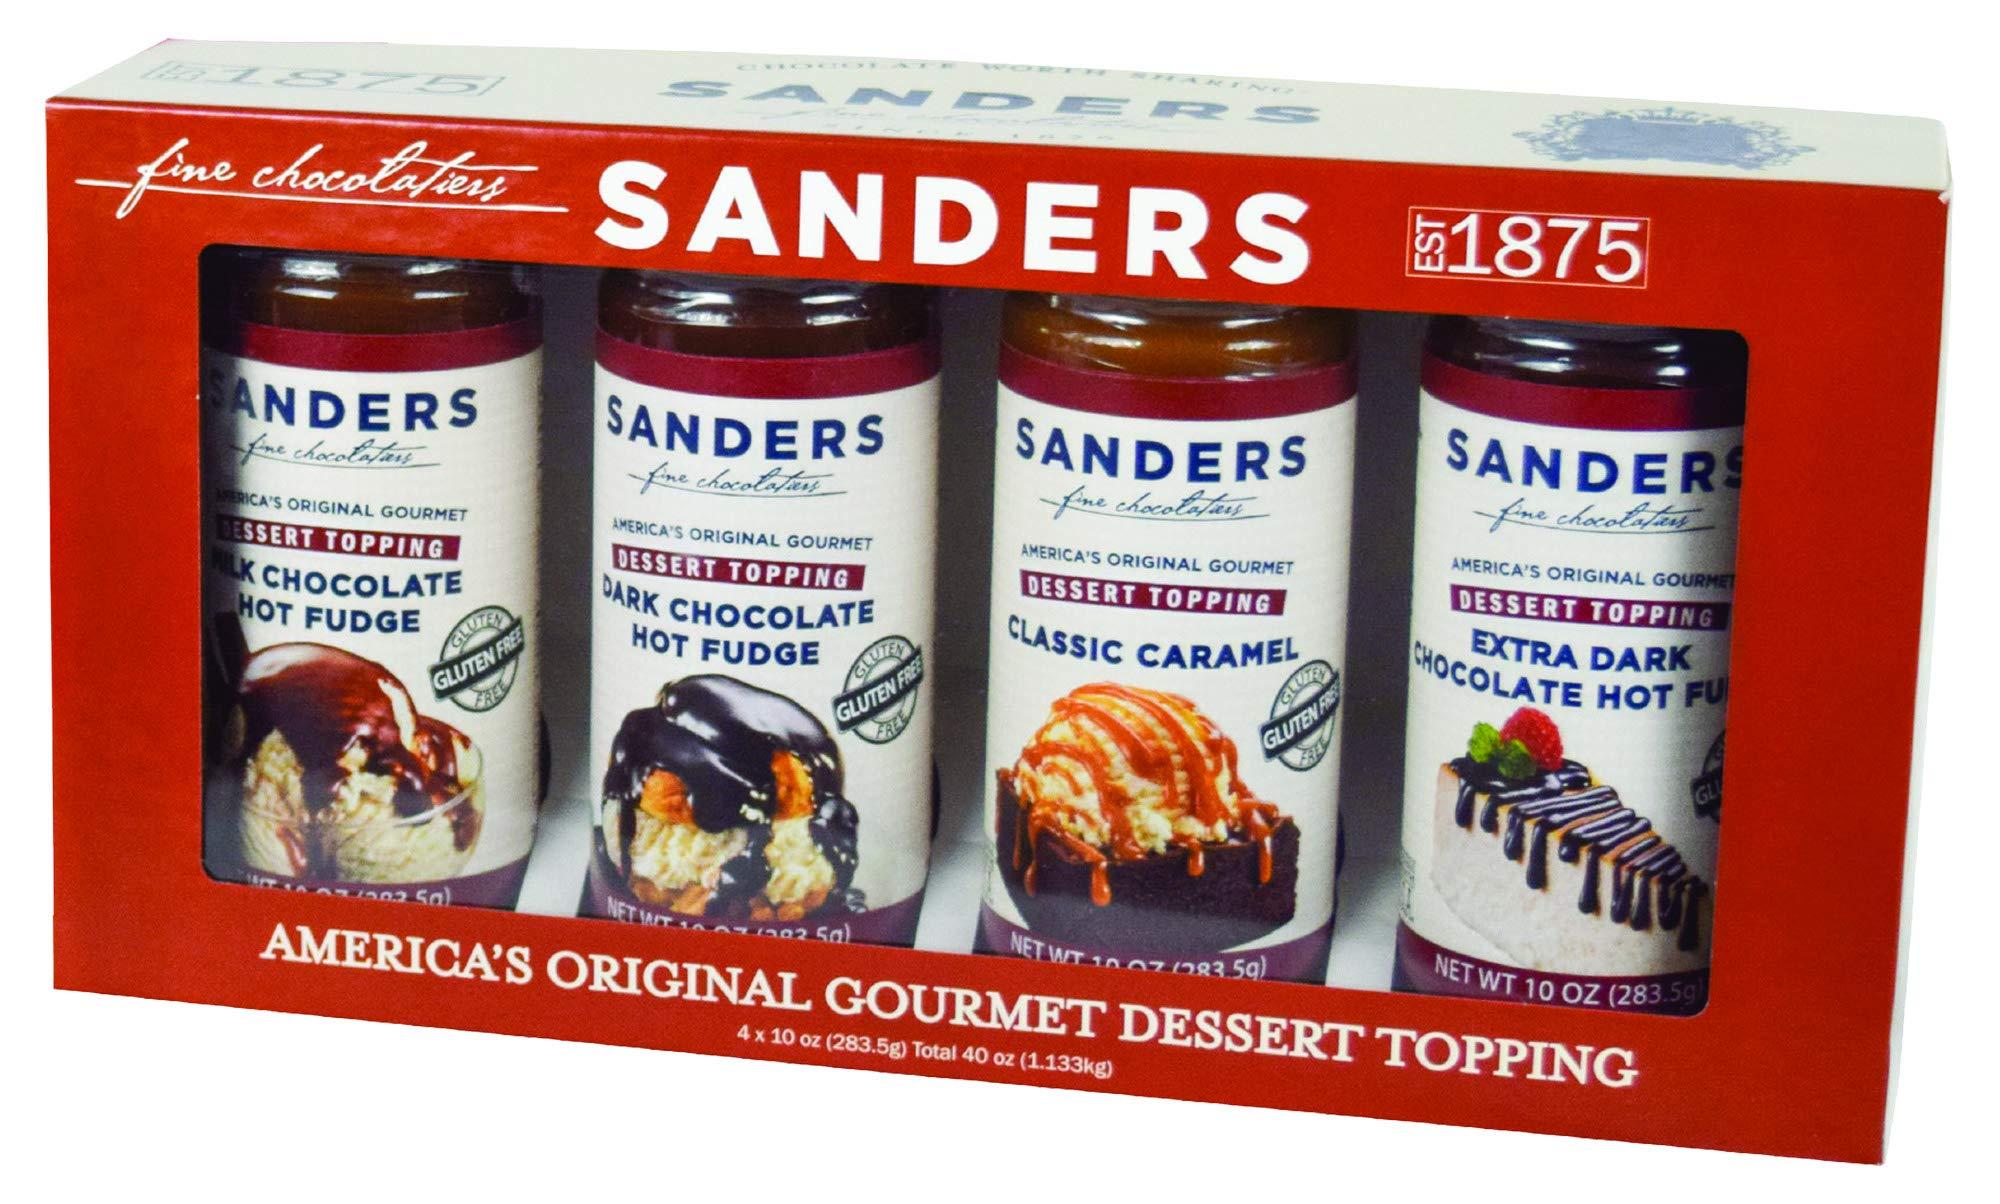 Sanders Sundae Best Dessert Gift Box - 4 All-Natural, Gluten Free Flavor Assortment - Certified Kosher, 40 oz. by Sanders